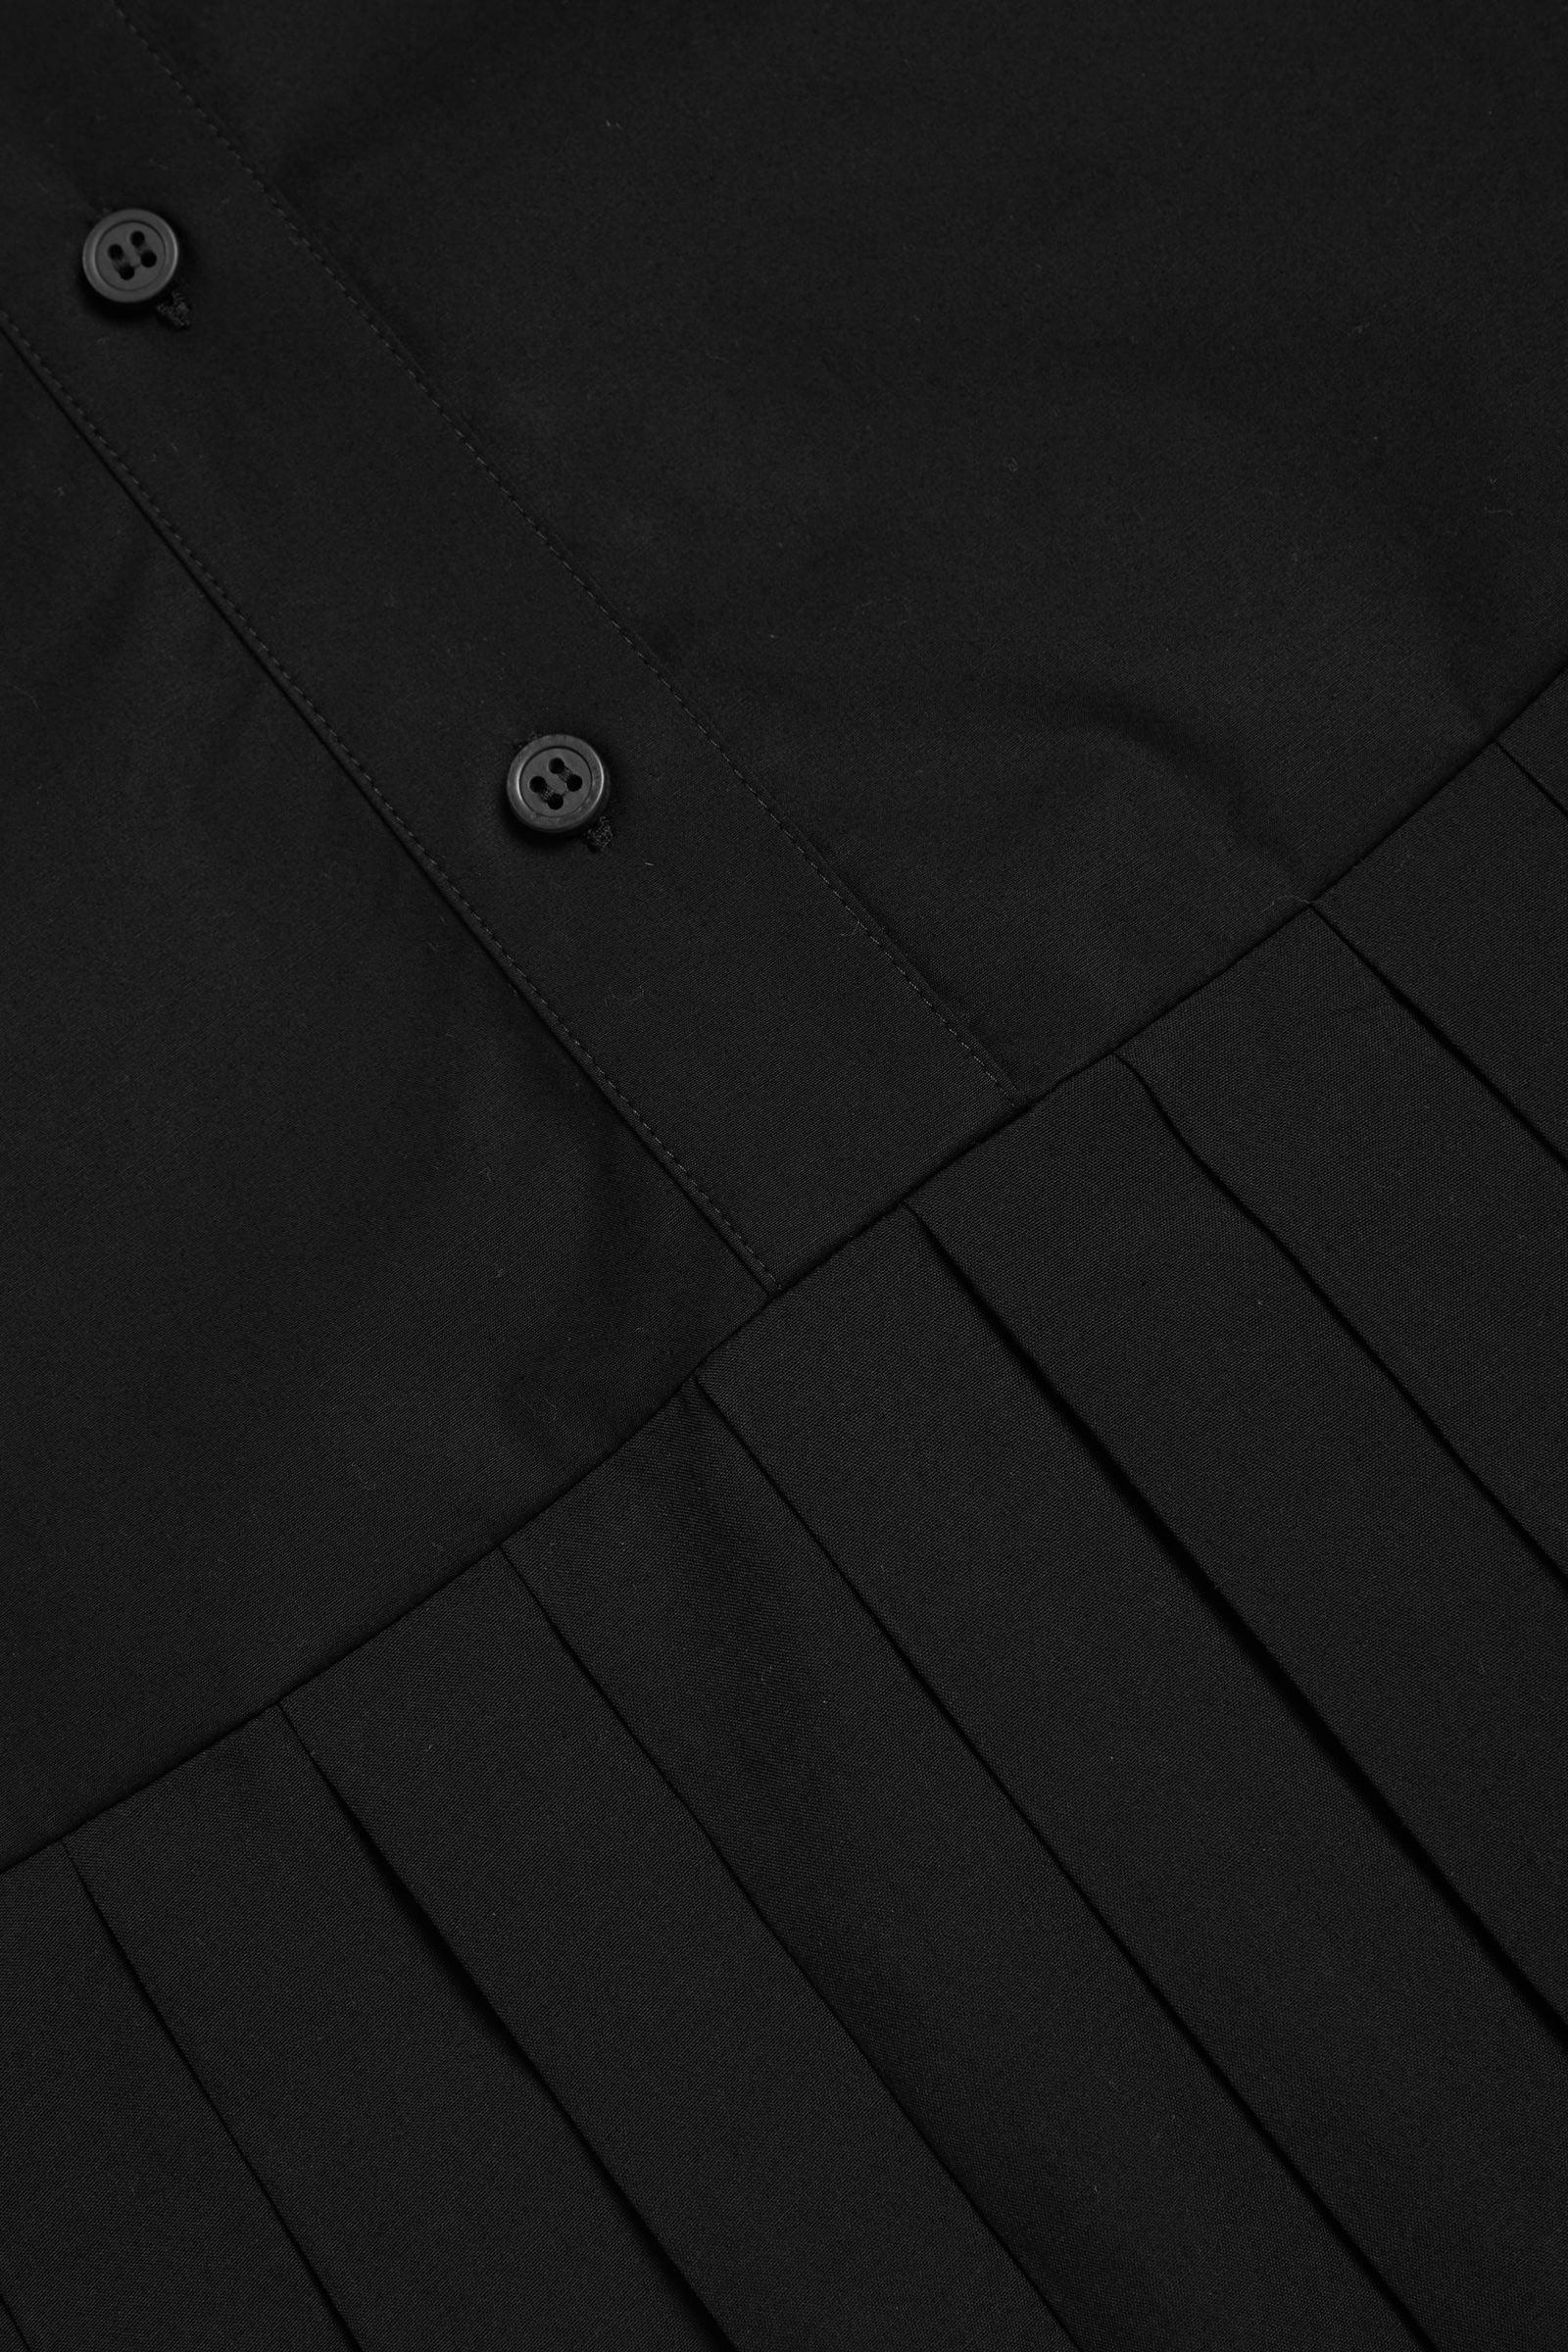 COS 오가닉 코튼 플리츠 패널 드레스의 블랙컬러 Detail입니다.